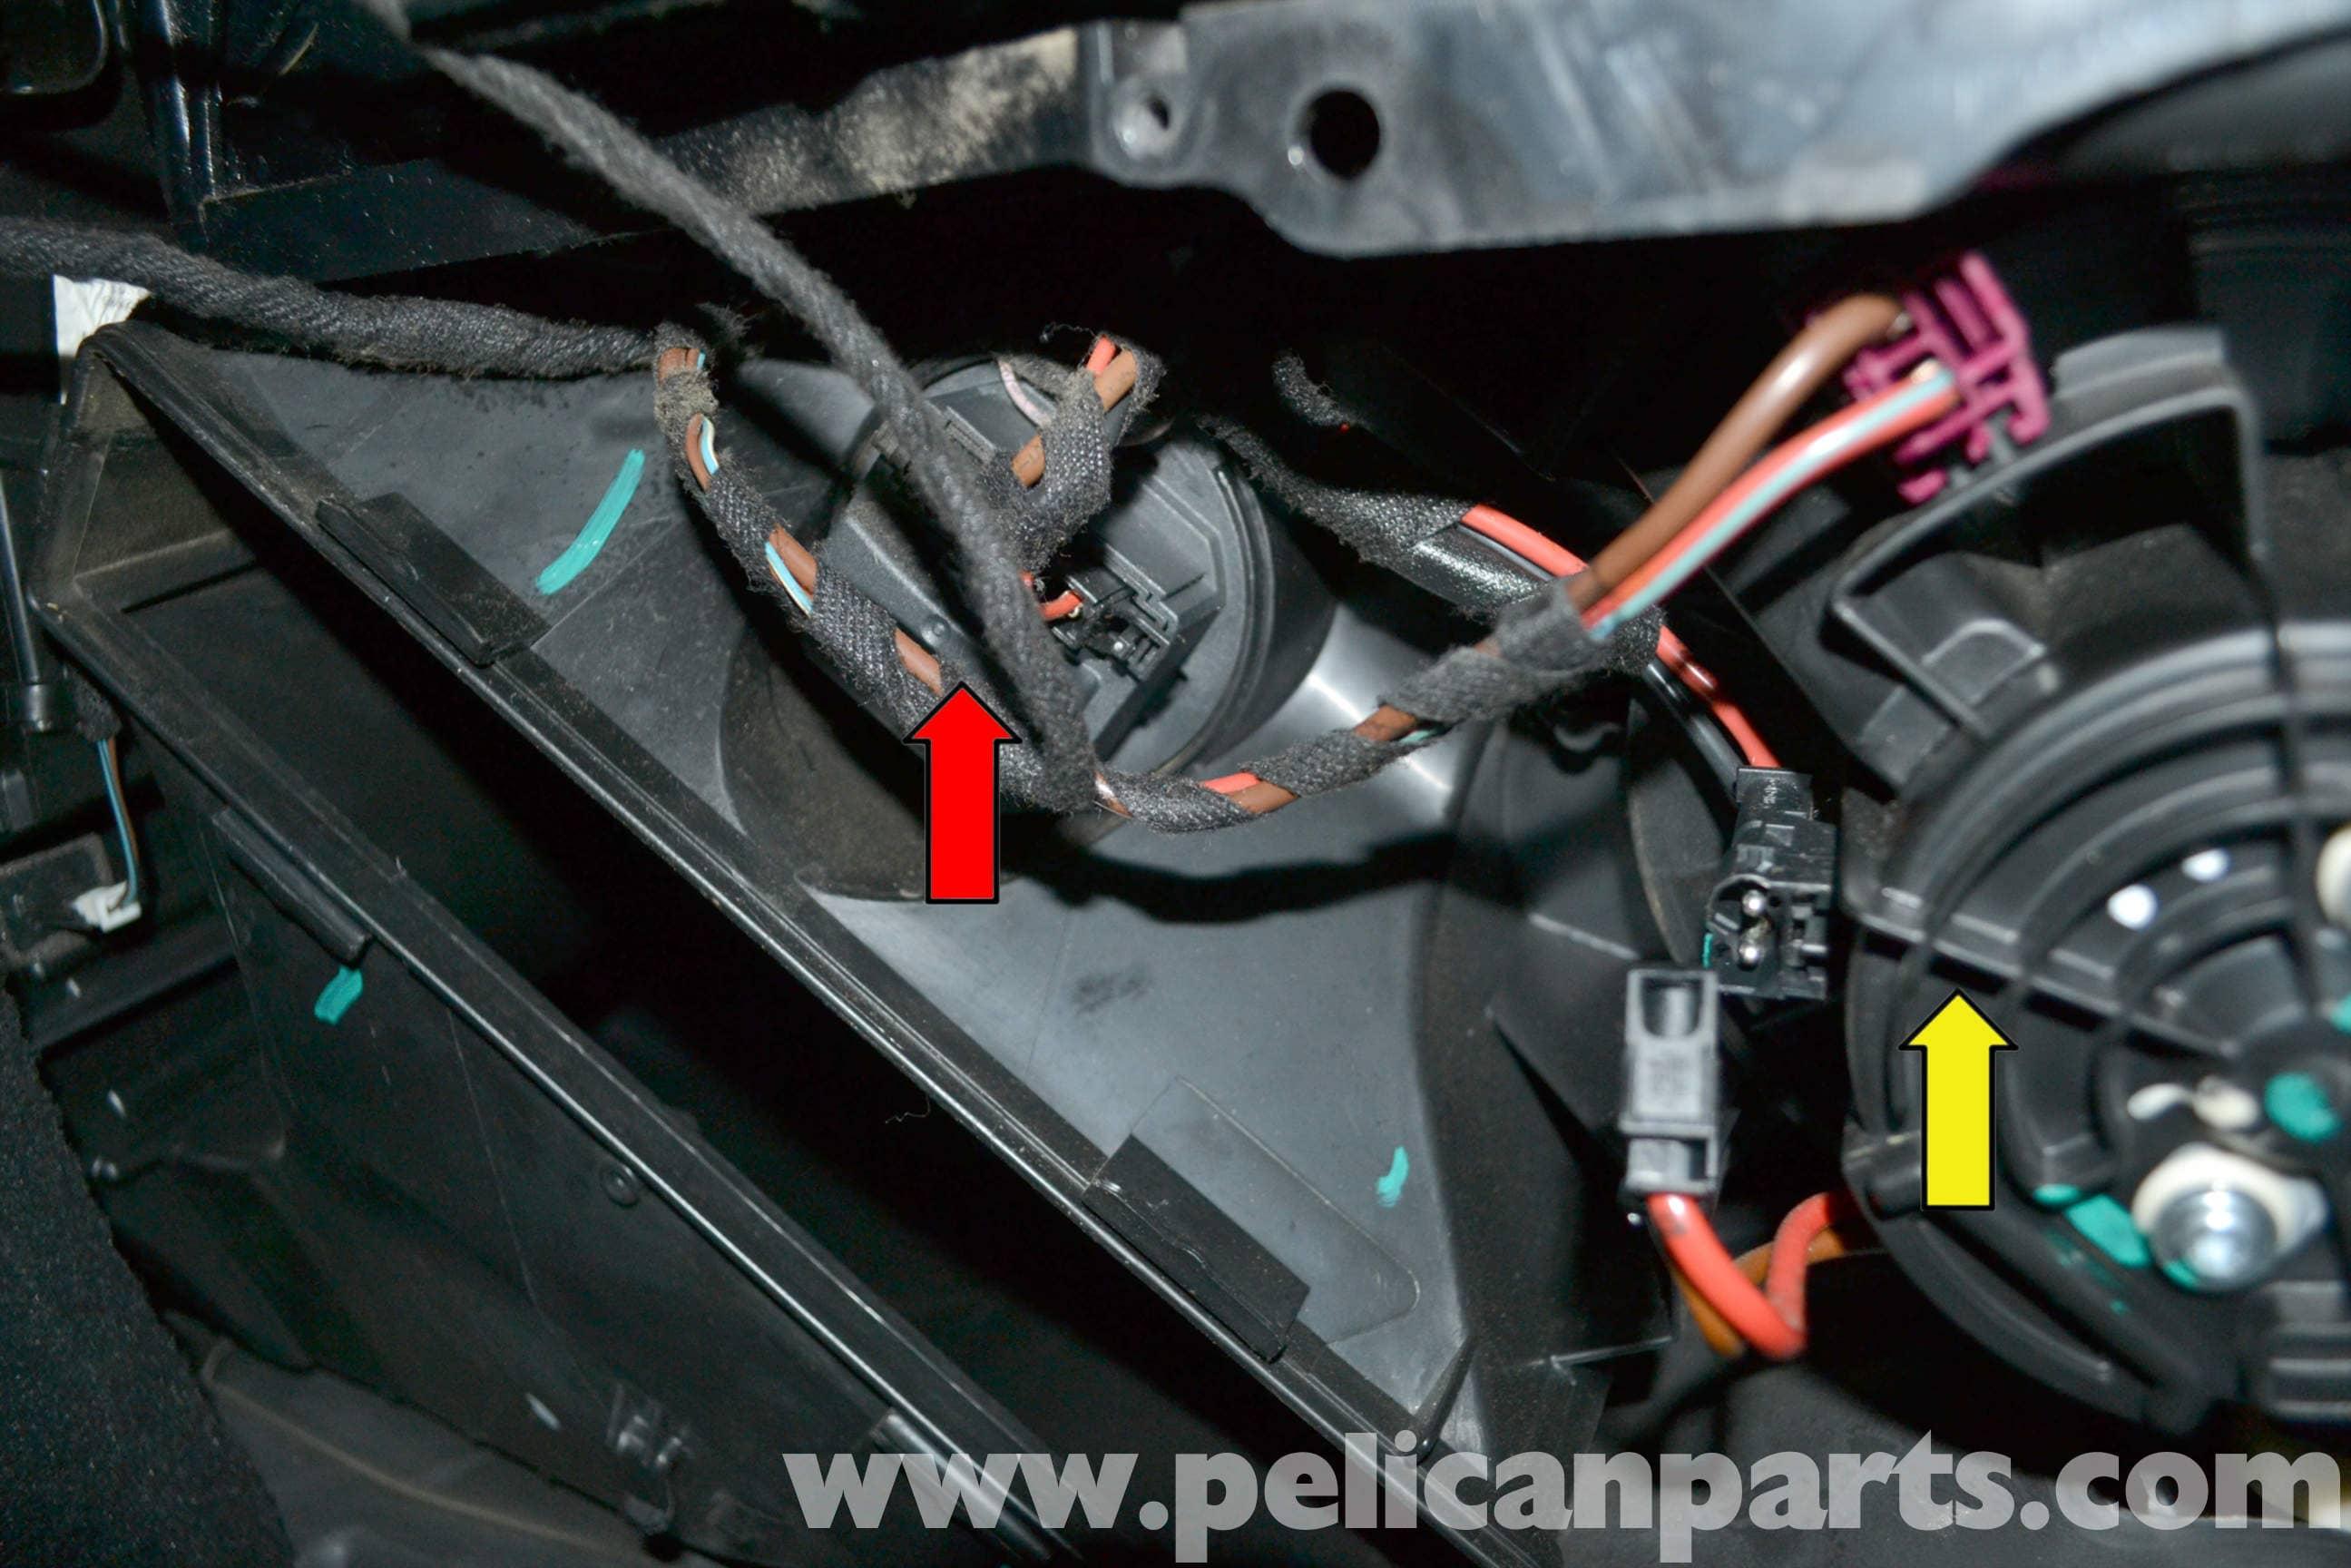 Mercedes-Benz W204 Blower Motor Resistor Replacement - (2008-2014